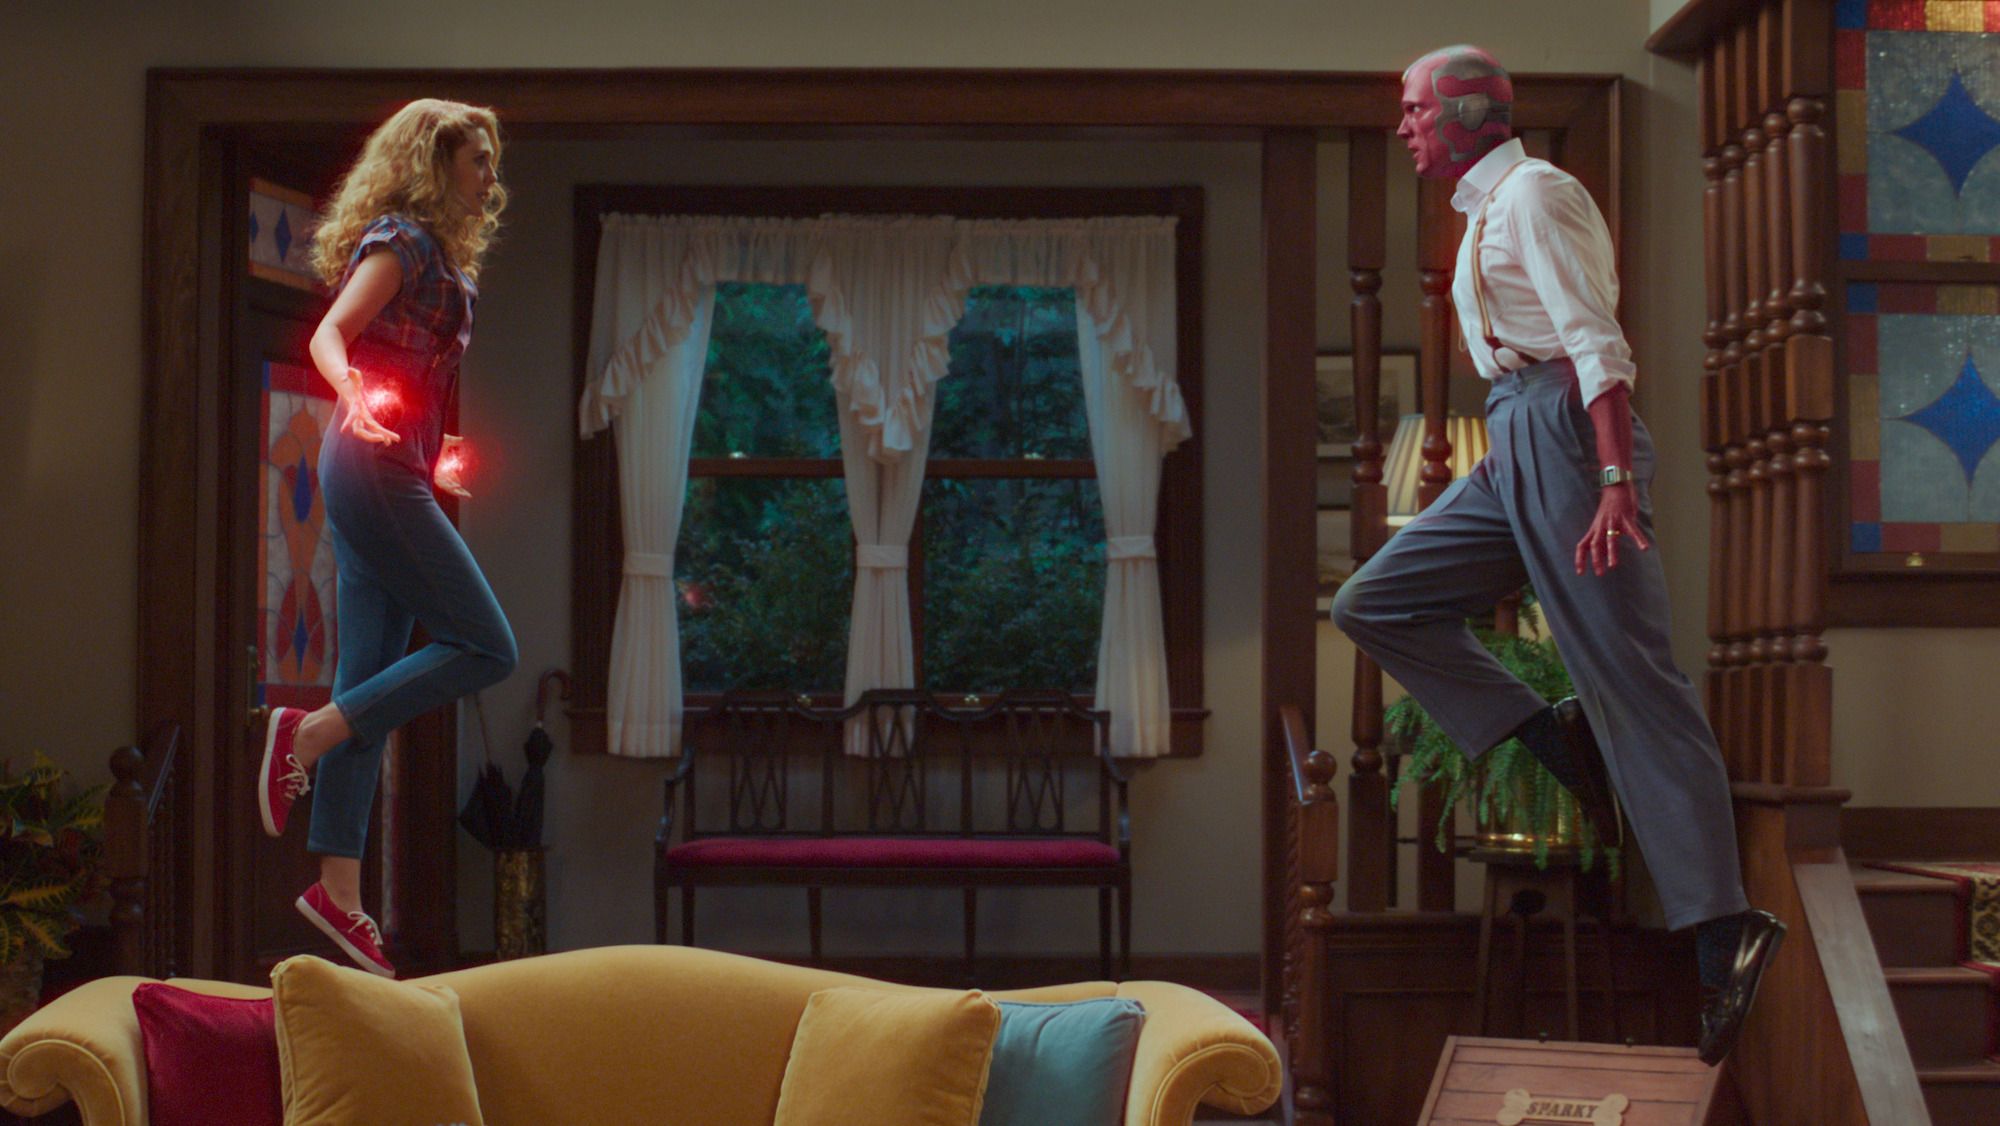 Elizabeth Olsen as Wanda Maximoff and Paul Bettany as Vision